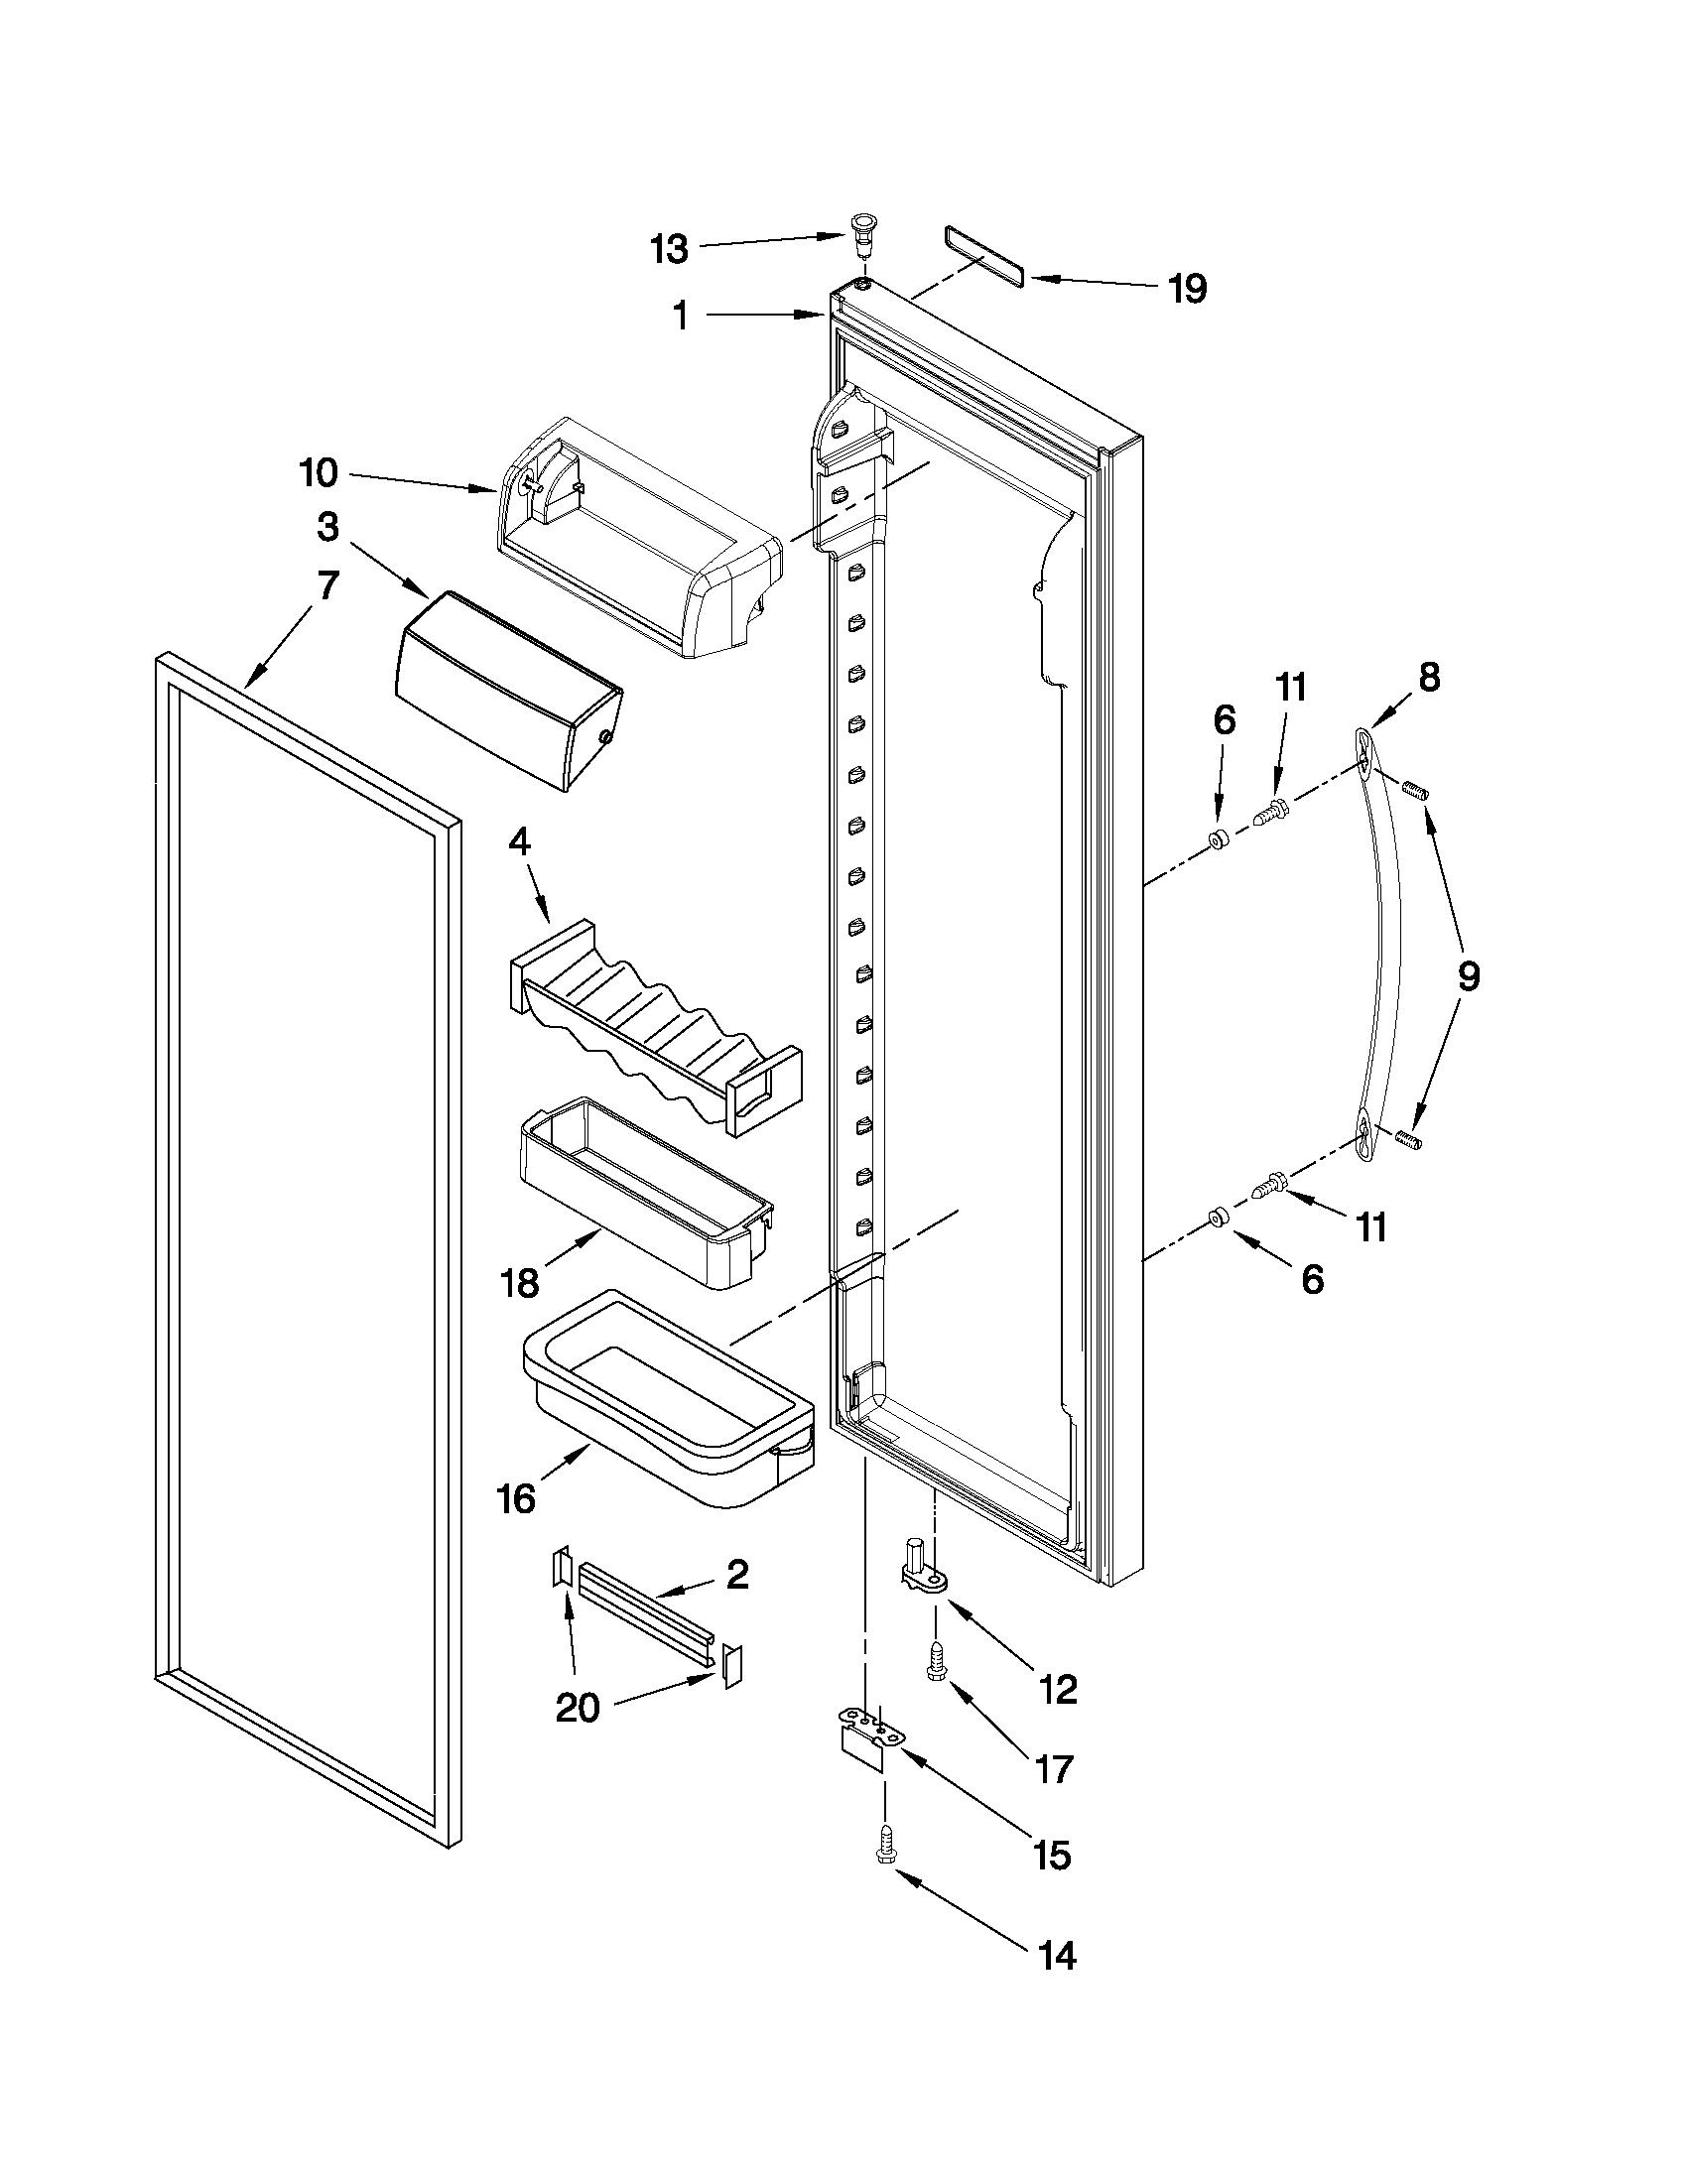 Kitchenaid Model Kscs25fvms03 Side By Side Refrigerator